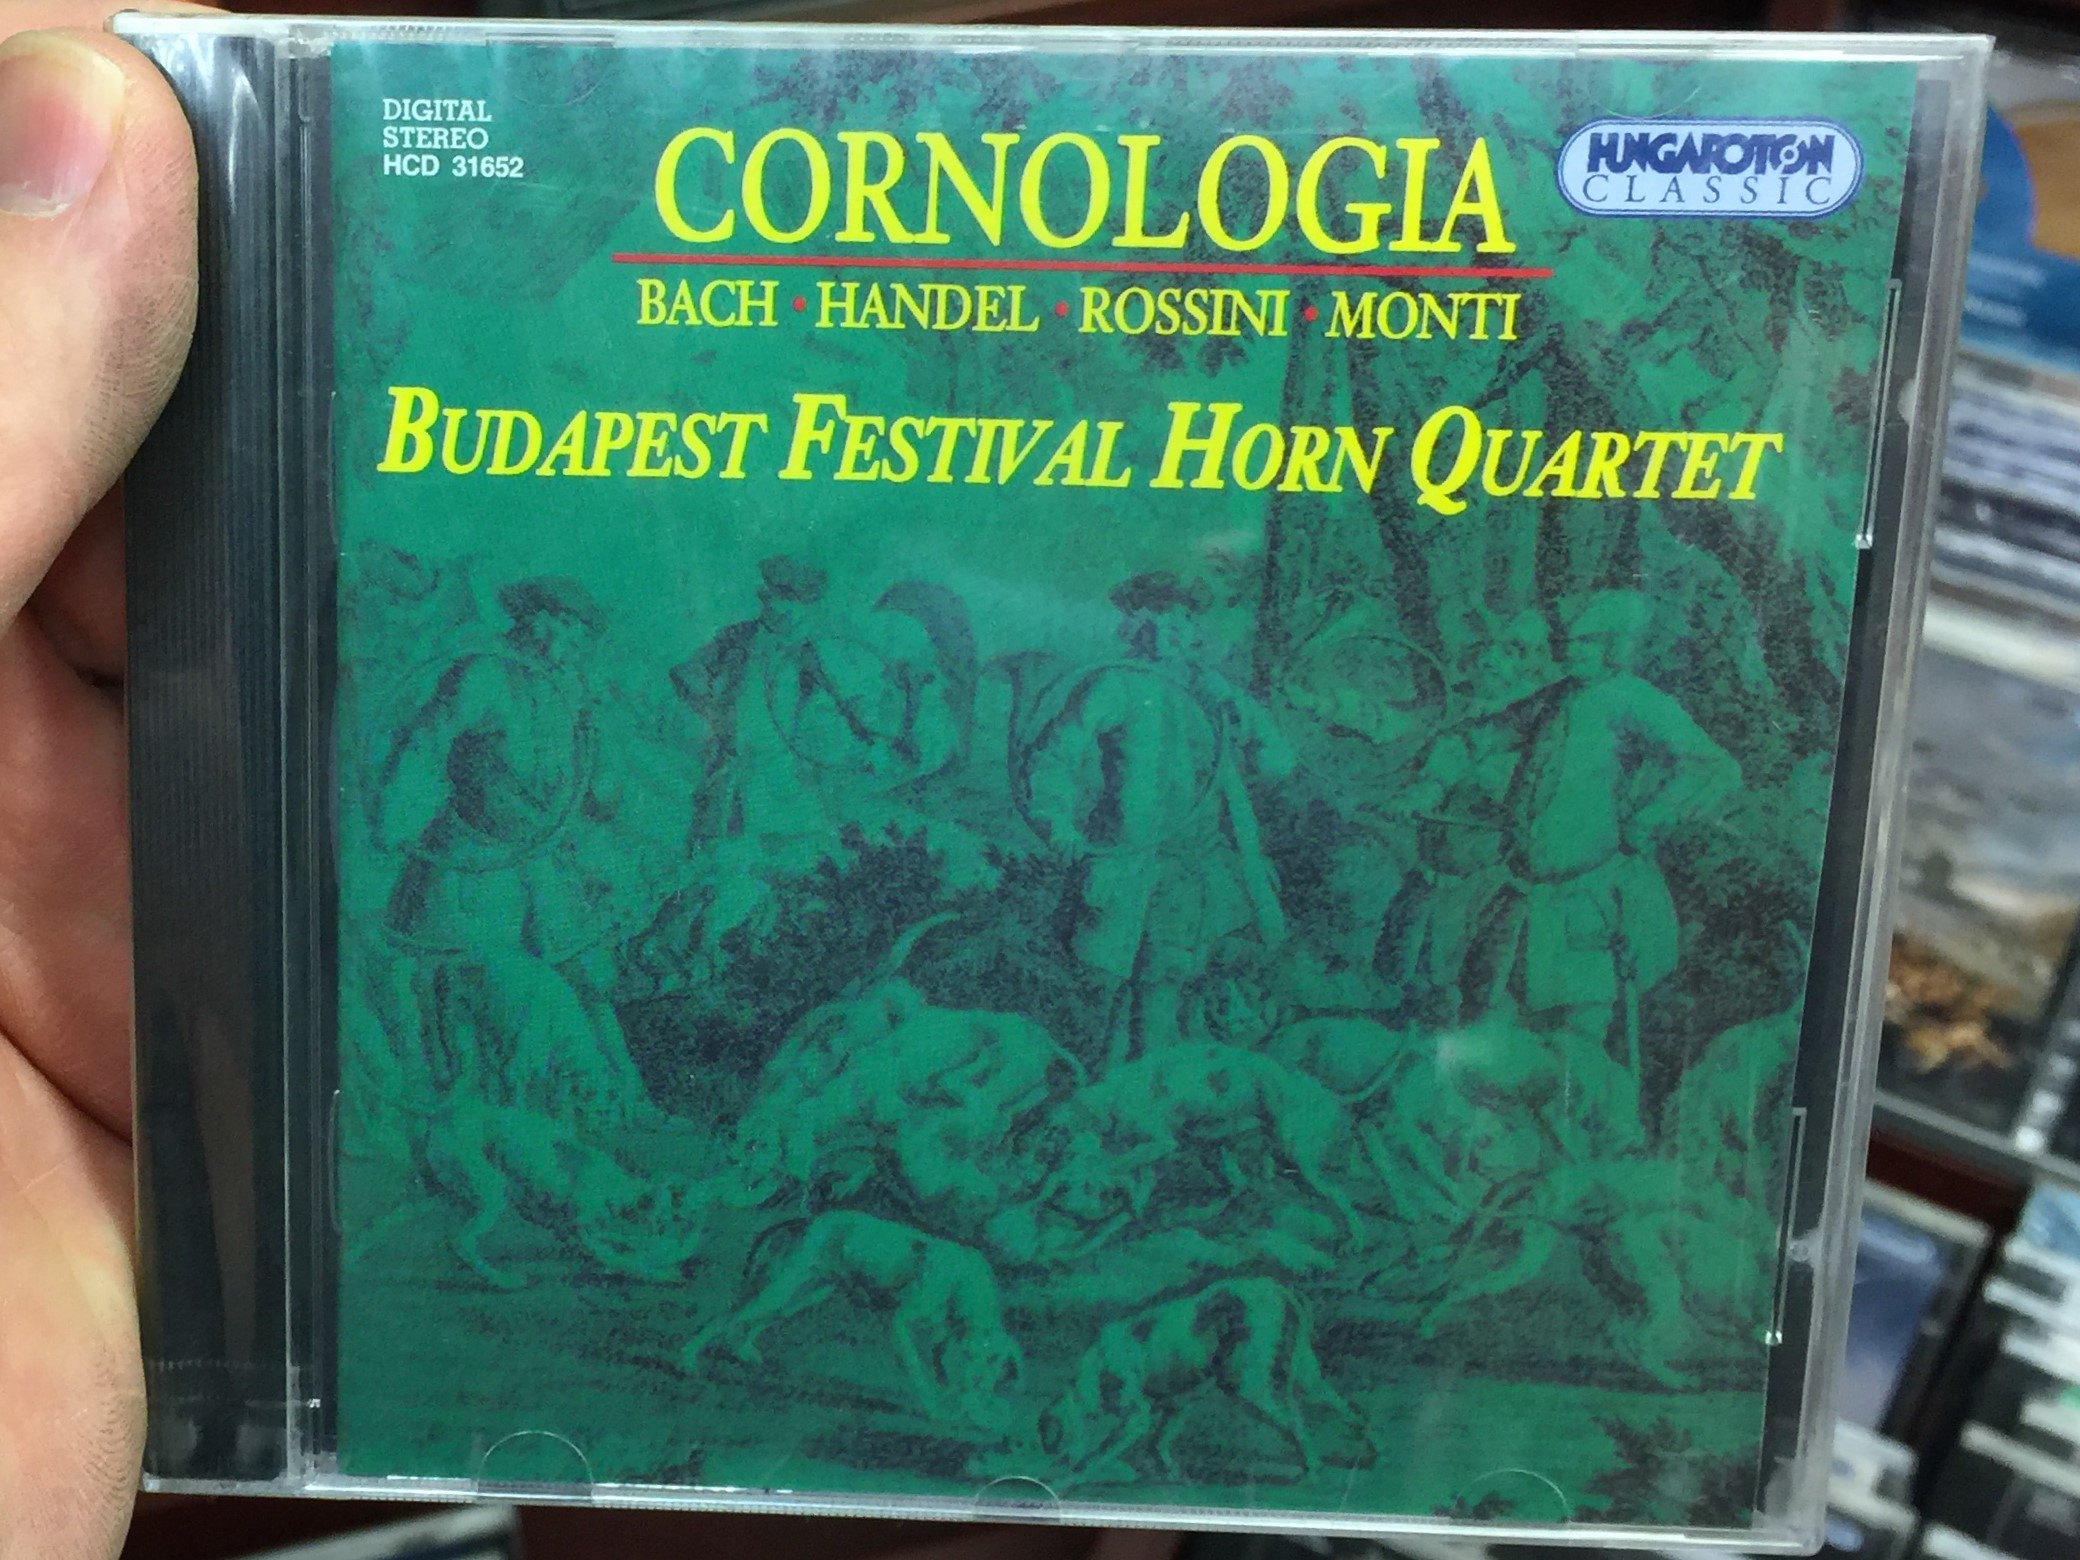 cornologia-bach-handel-rossini-monti-budapest-festival-horn-quartet-hungaroton-classic-audio-cd-1996-stereo-hcd-31652-1-.jpg